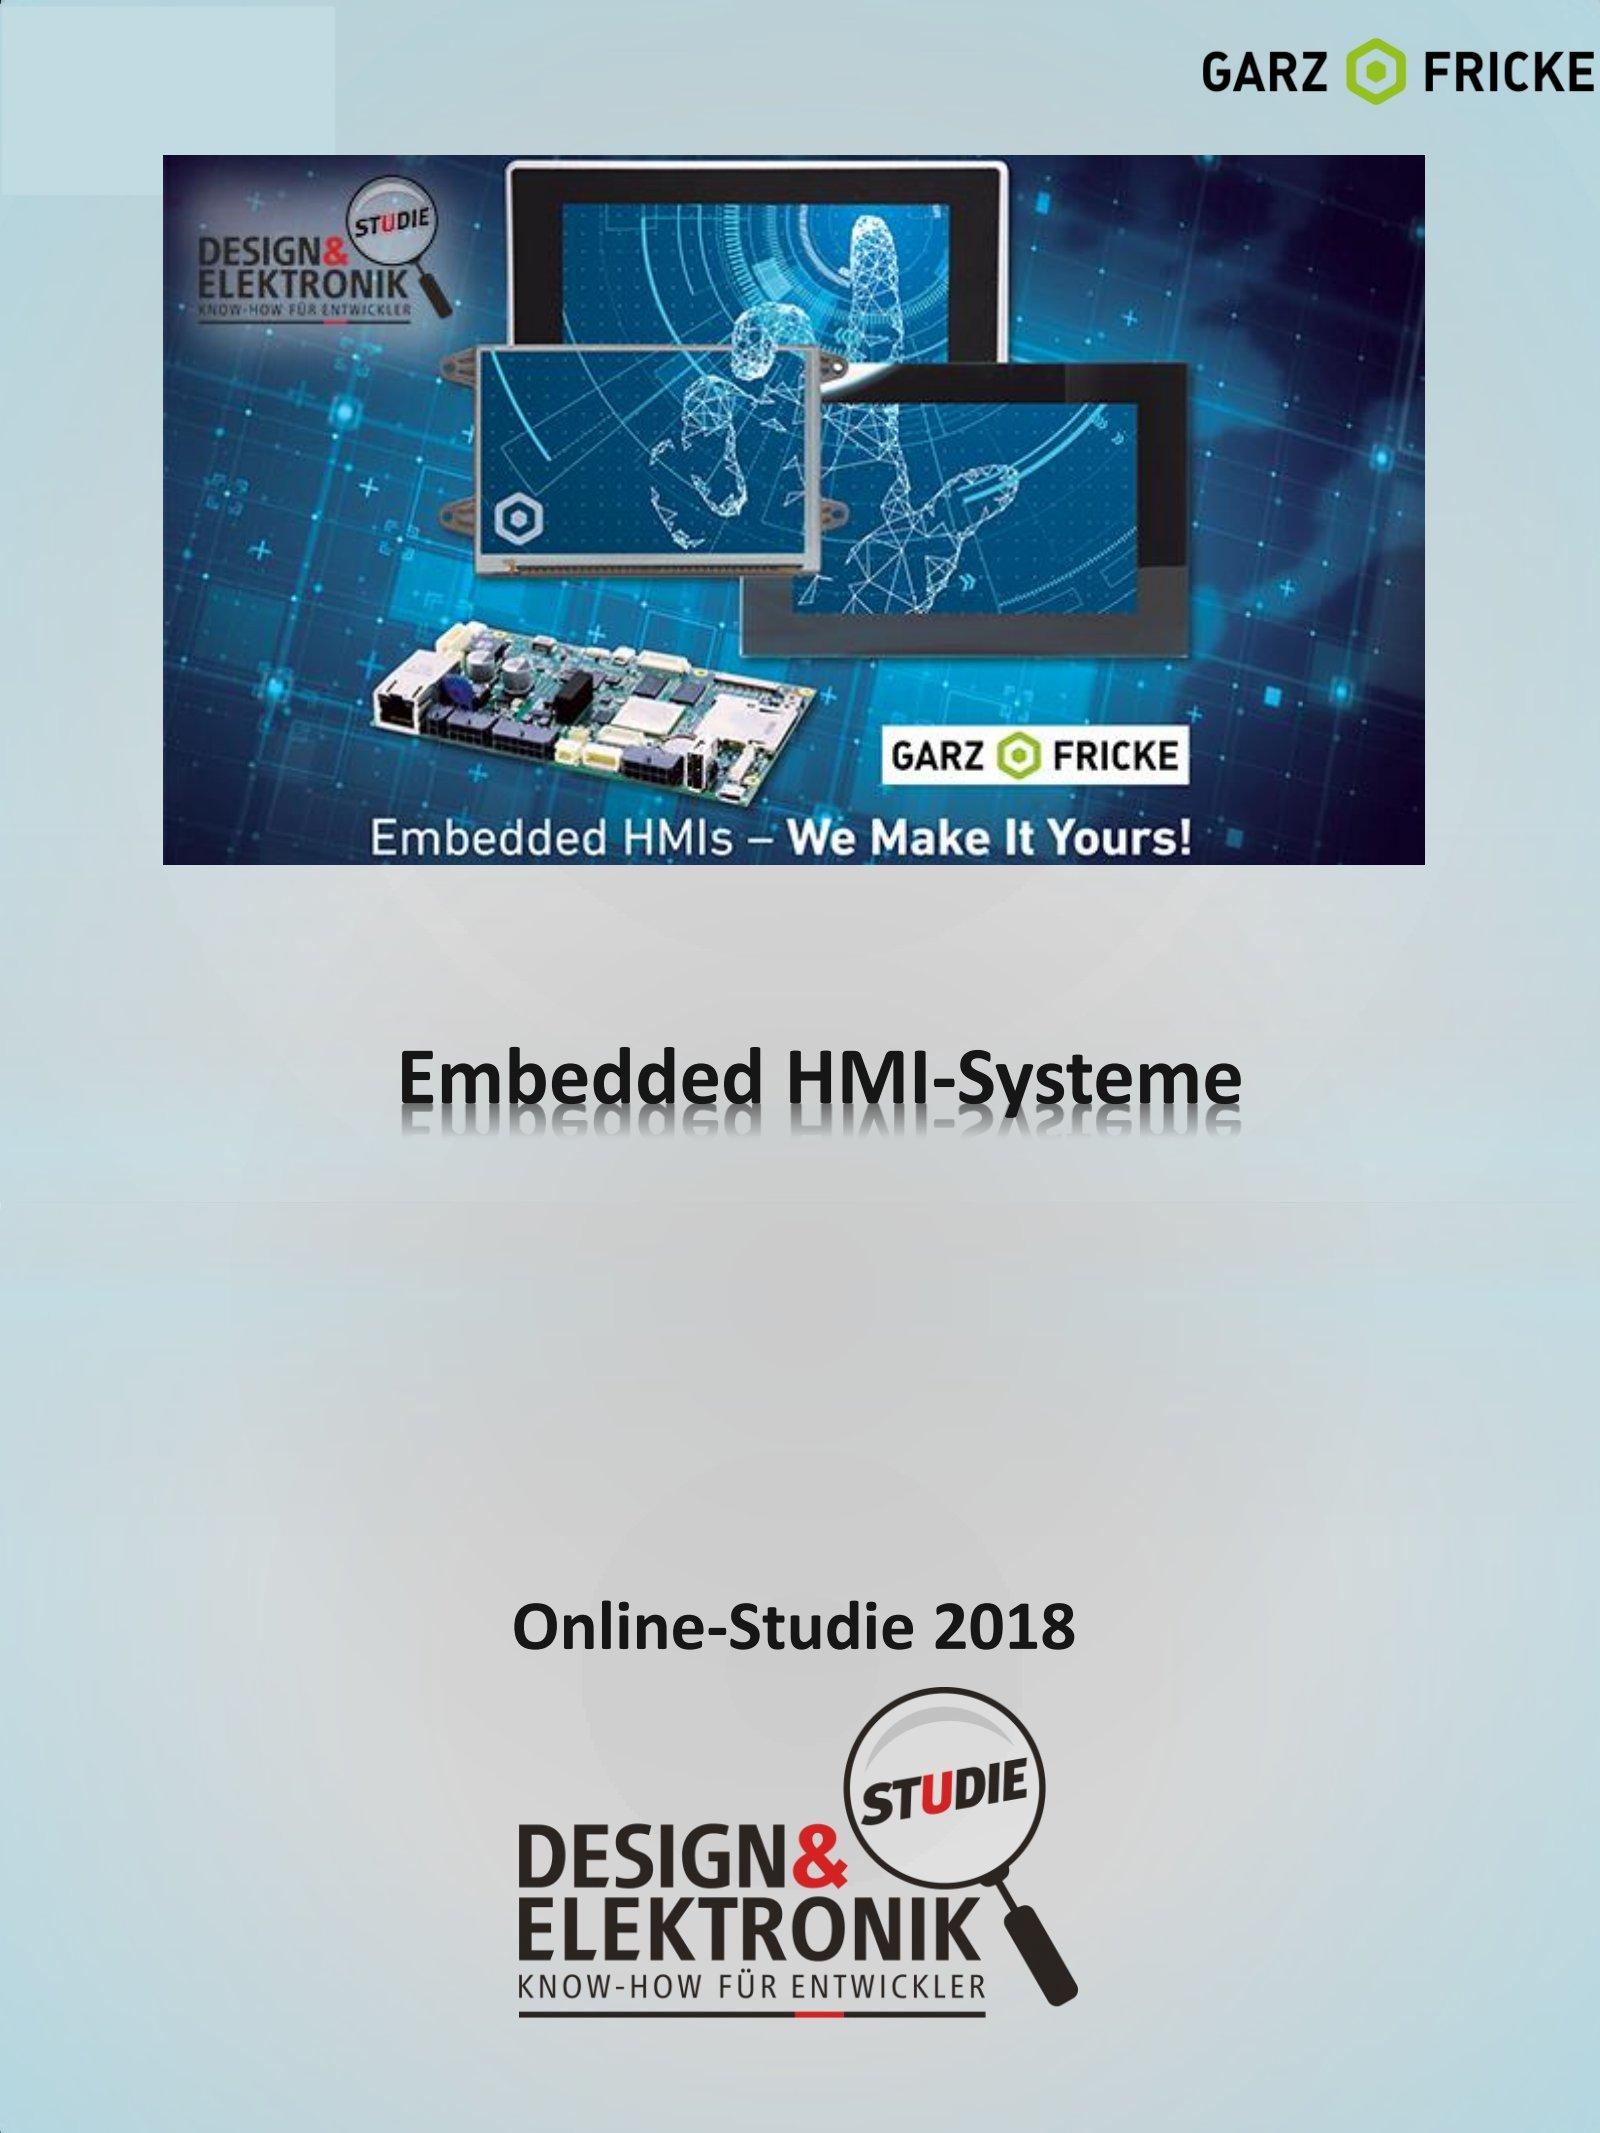 DESIGN&ELEKTRONIK Studie Embedded-HMI-Systeme 2018 Digital